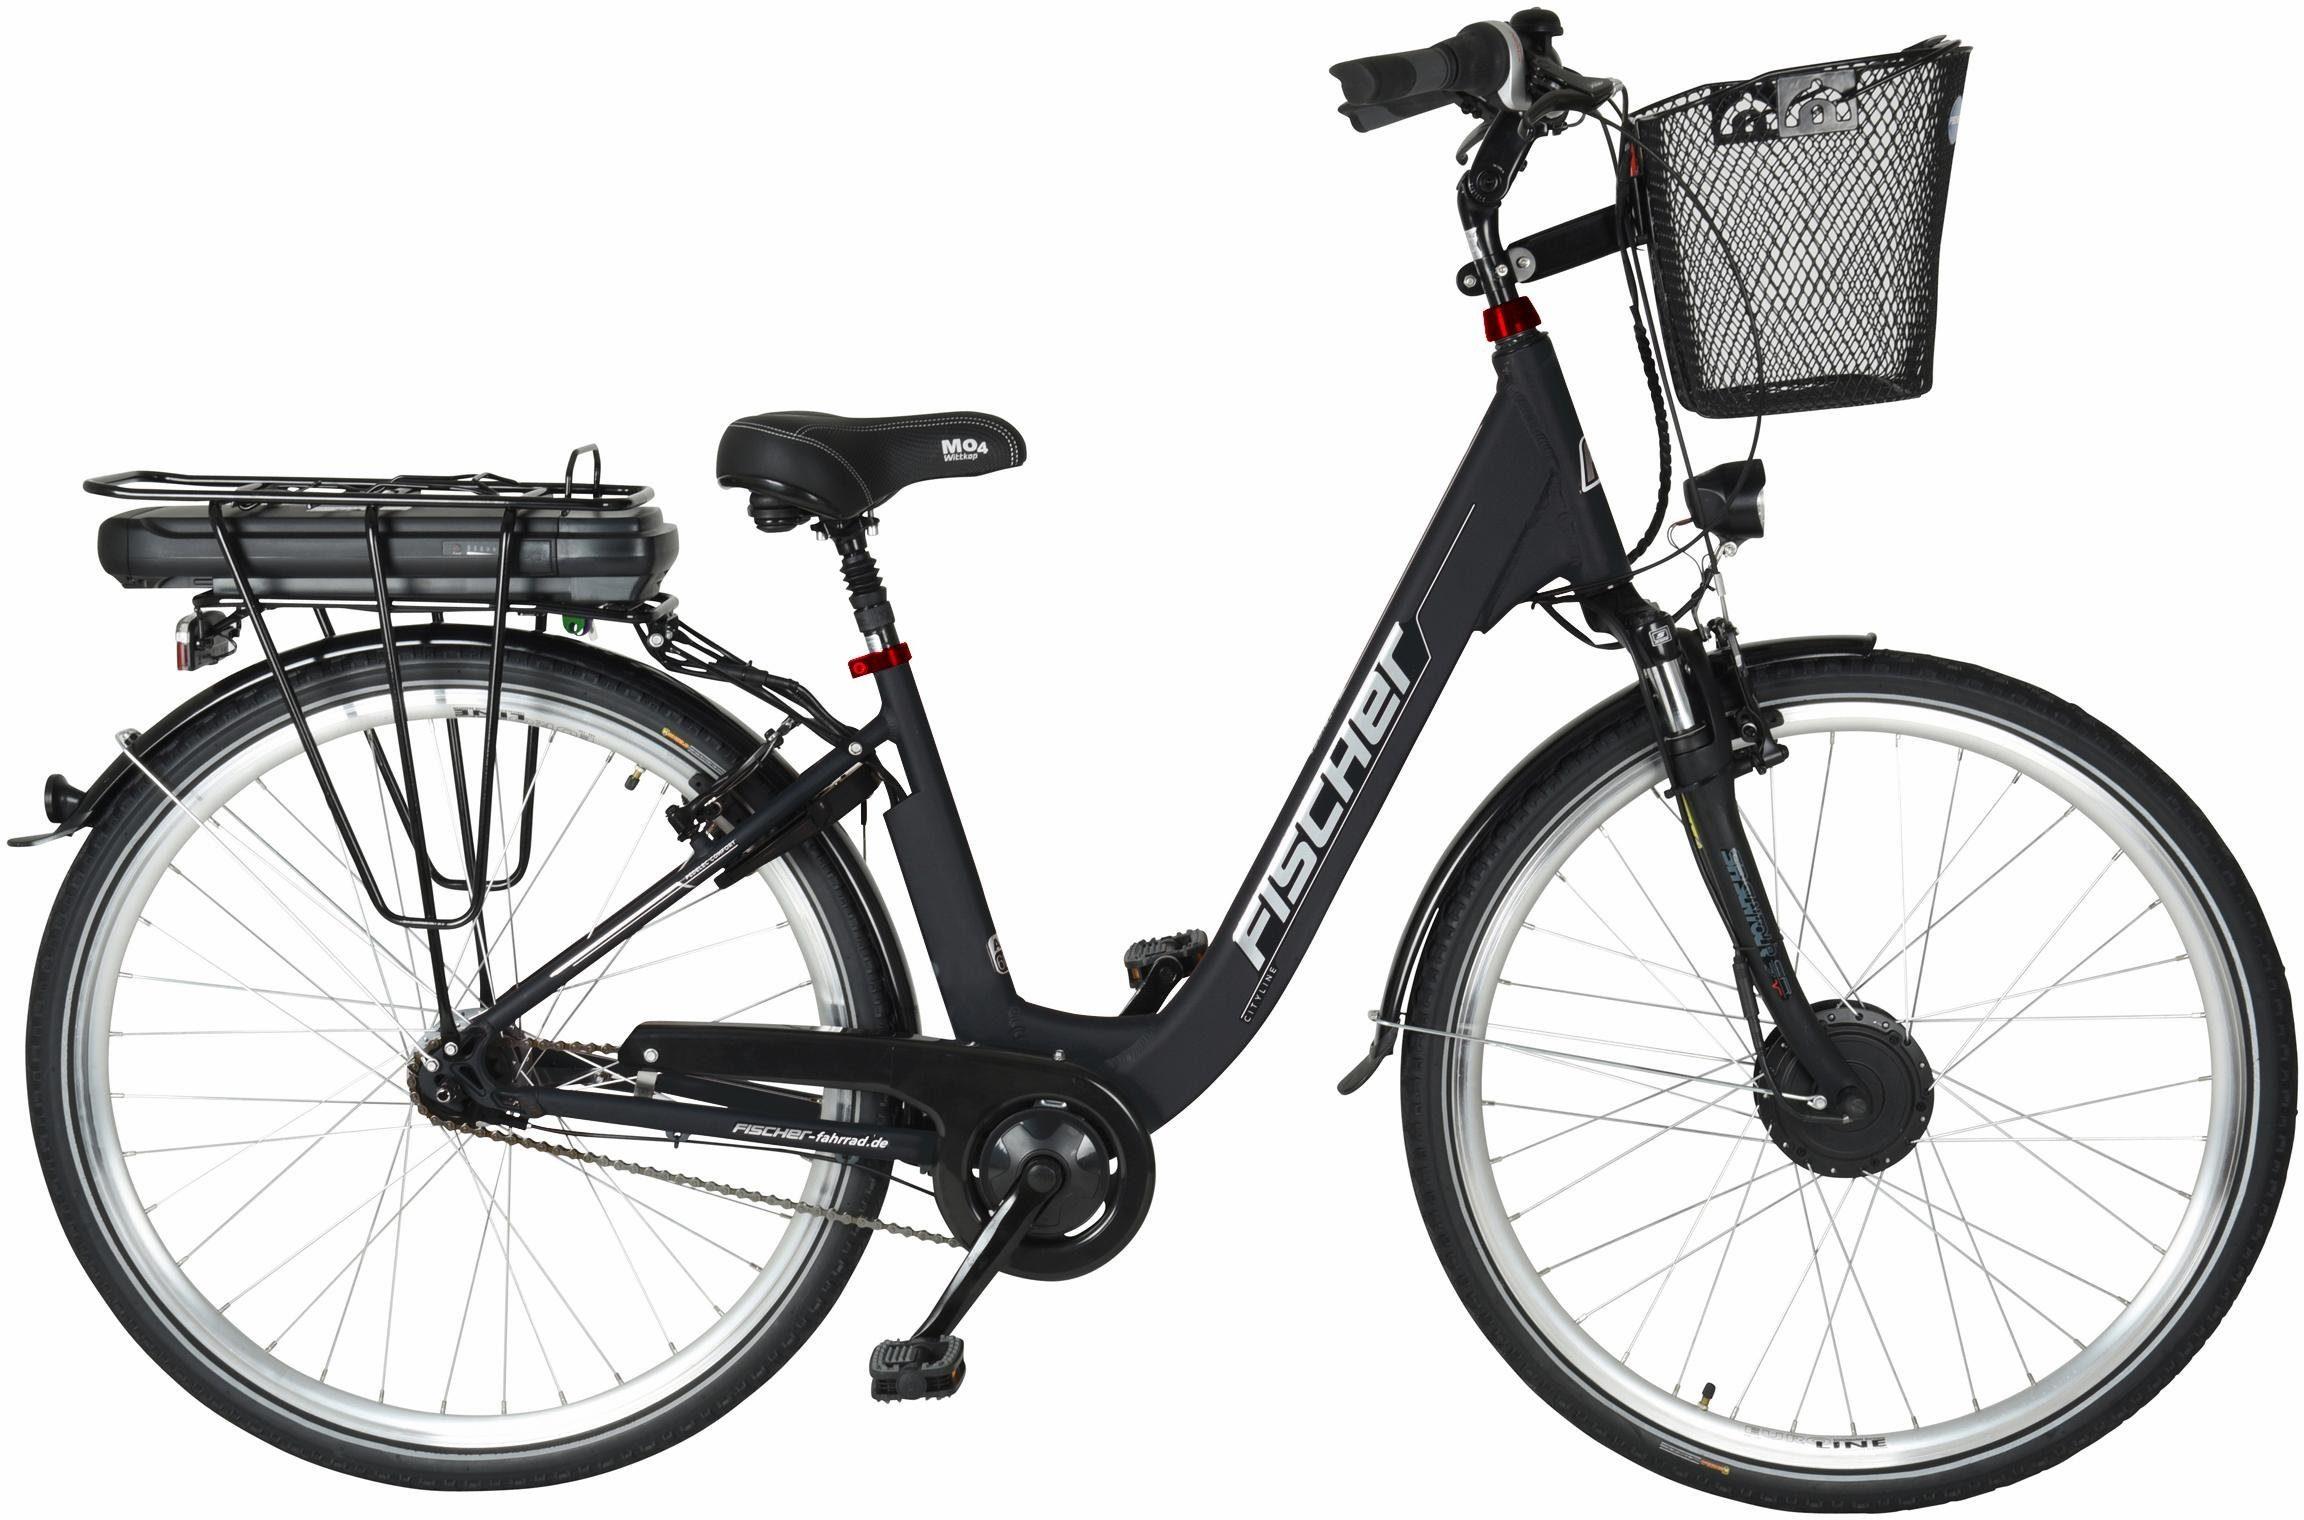 FISCHER City E-Bike, 36V/250W Vorderradmotor, 28 Z., 7-G.-Shimano Nabensch. m. Rücktritt, »ECU 1802«